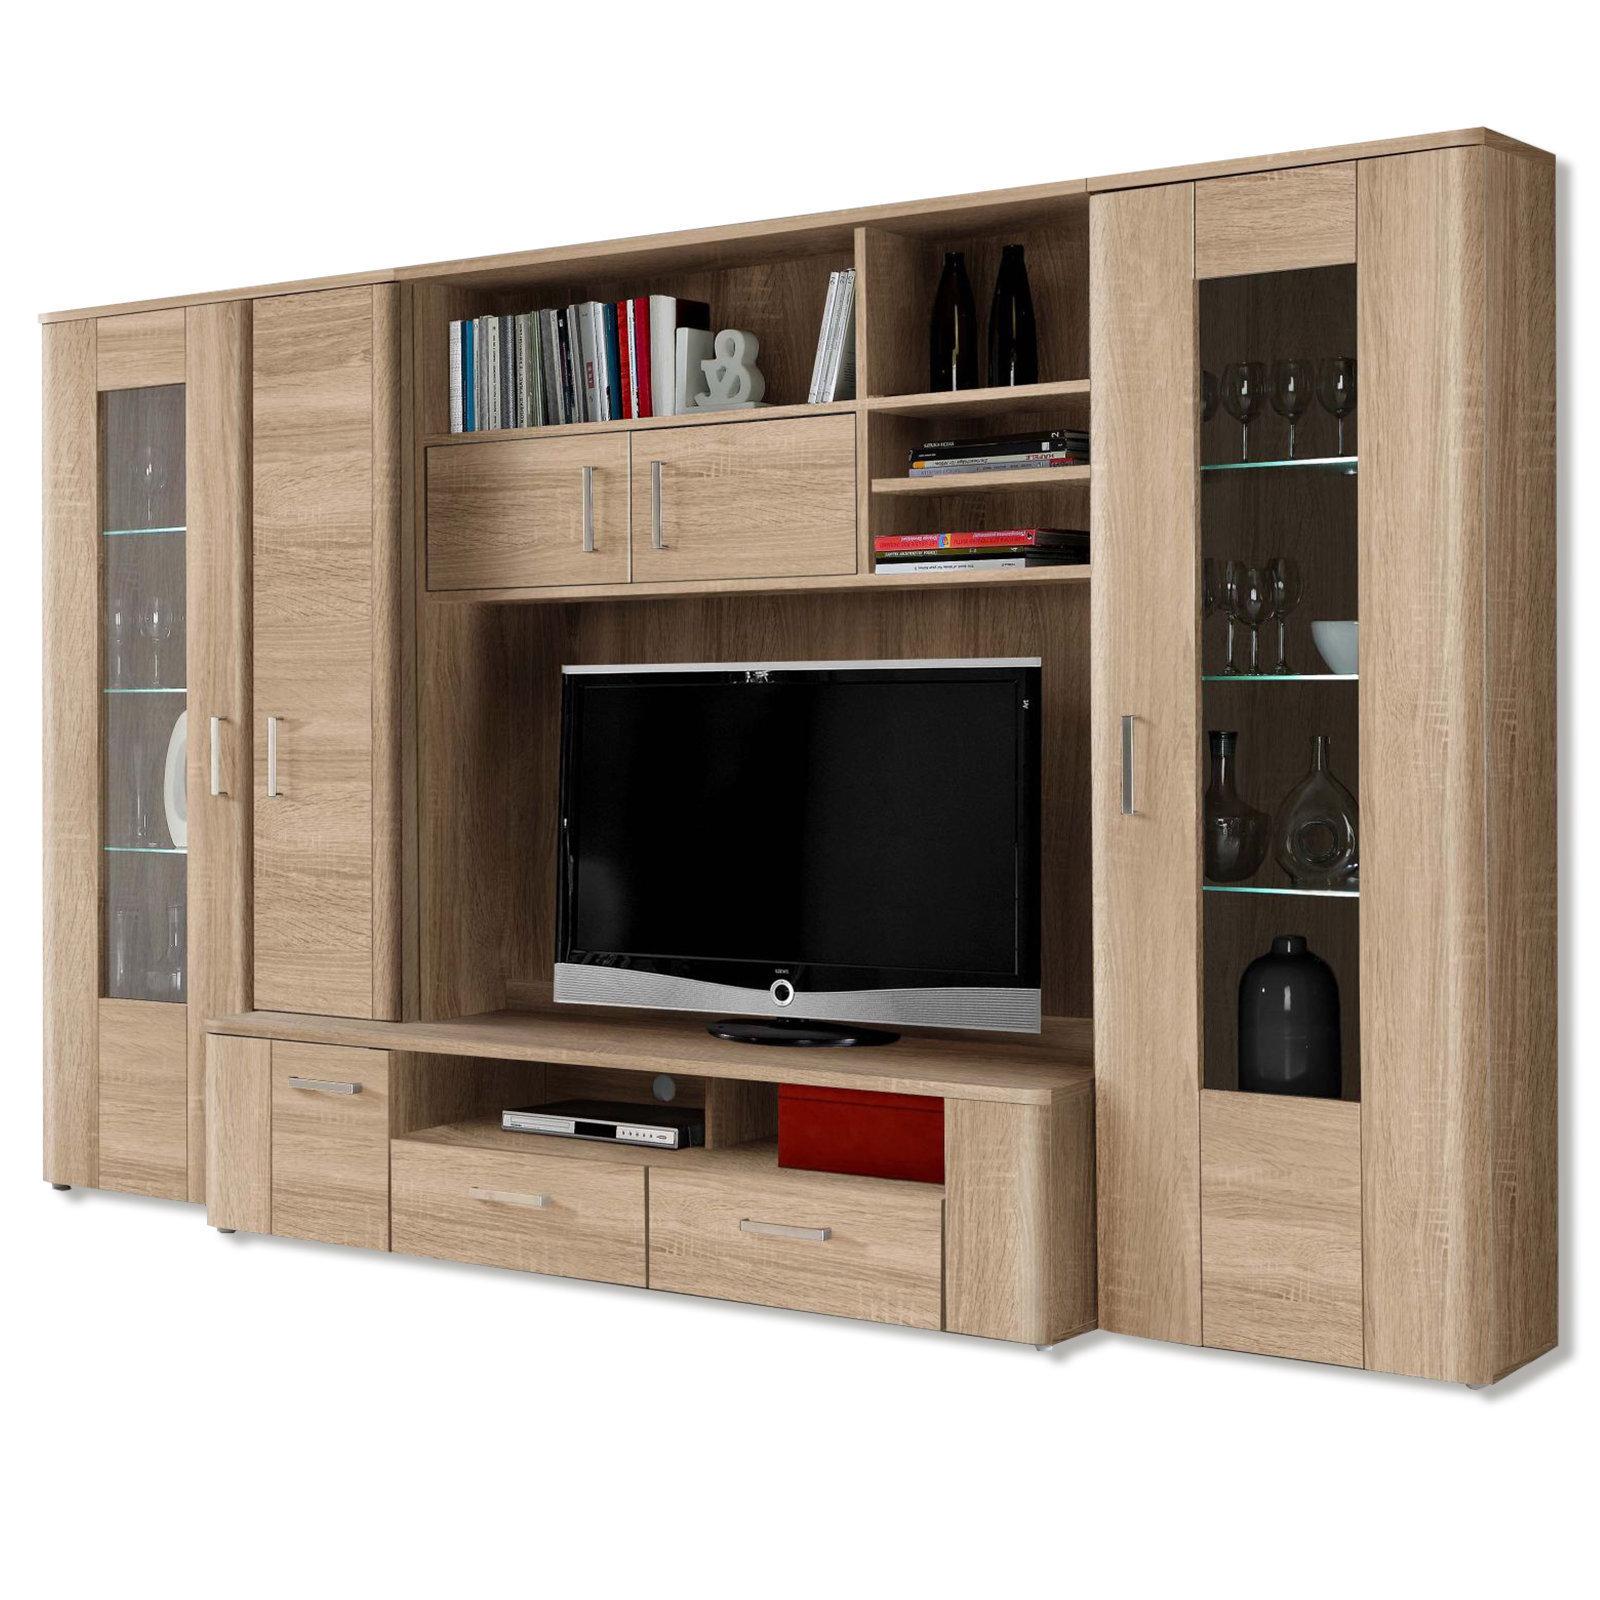 21 sparen wohnwand belmondo inkl beleuchtung nur 549 99 cherry m bel. Black Bedroom Furniture Sets. Home Design Ideas